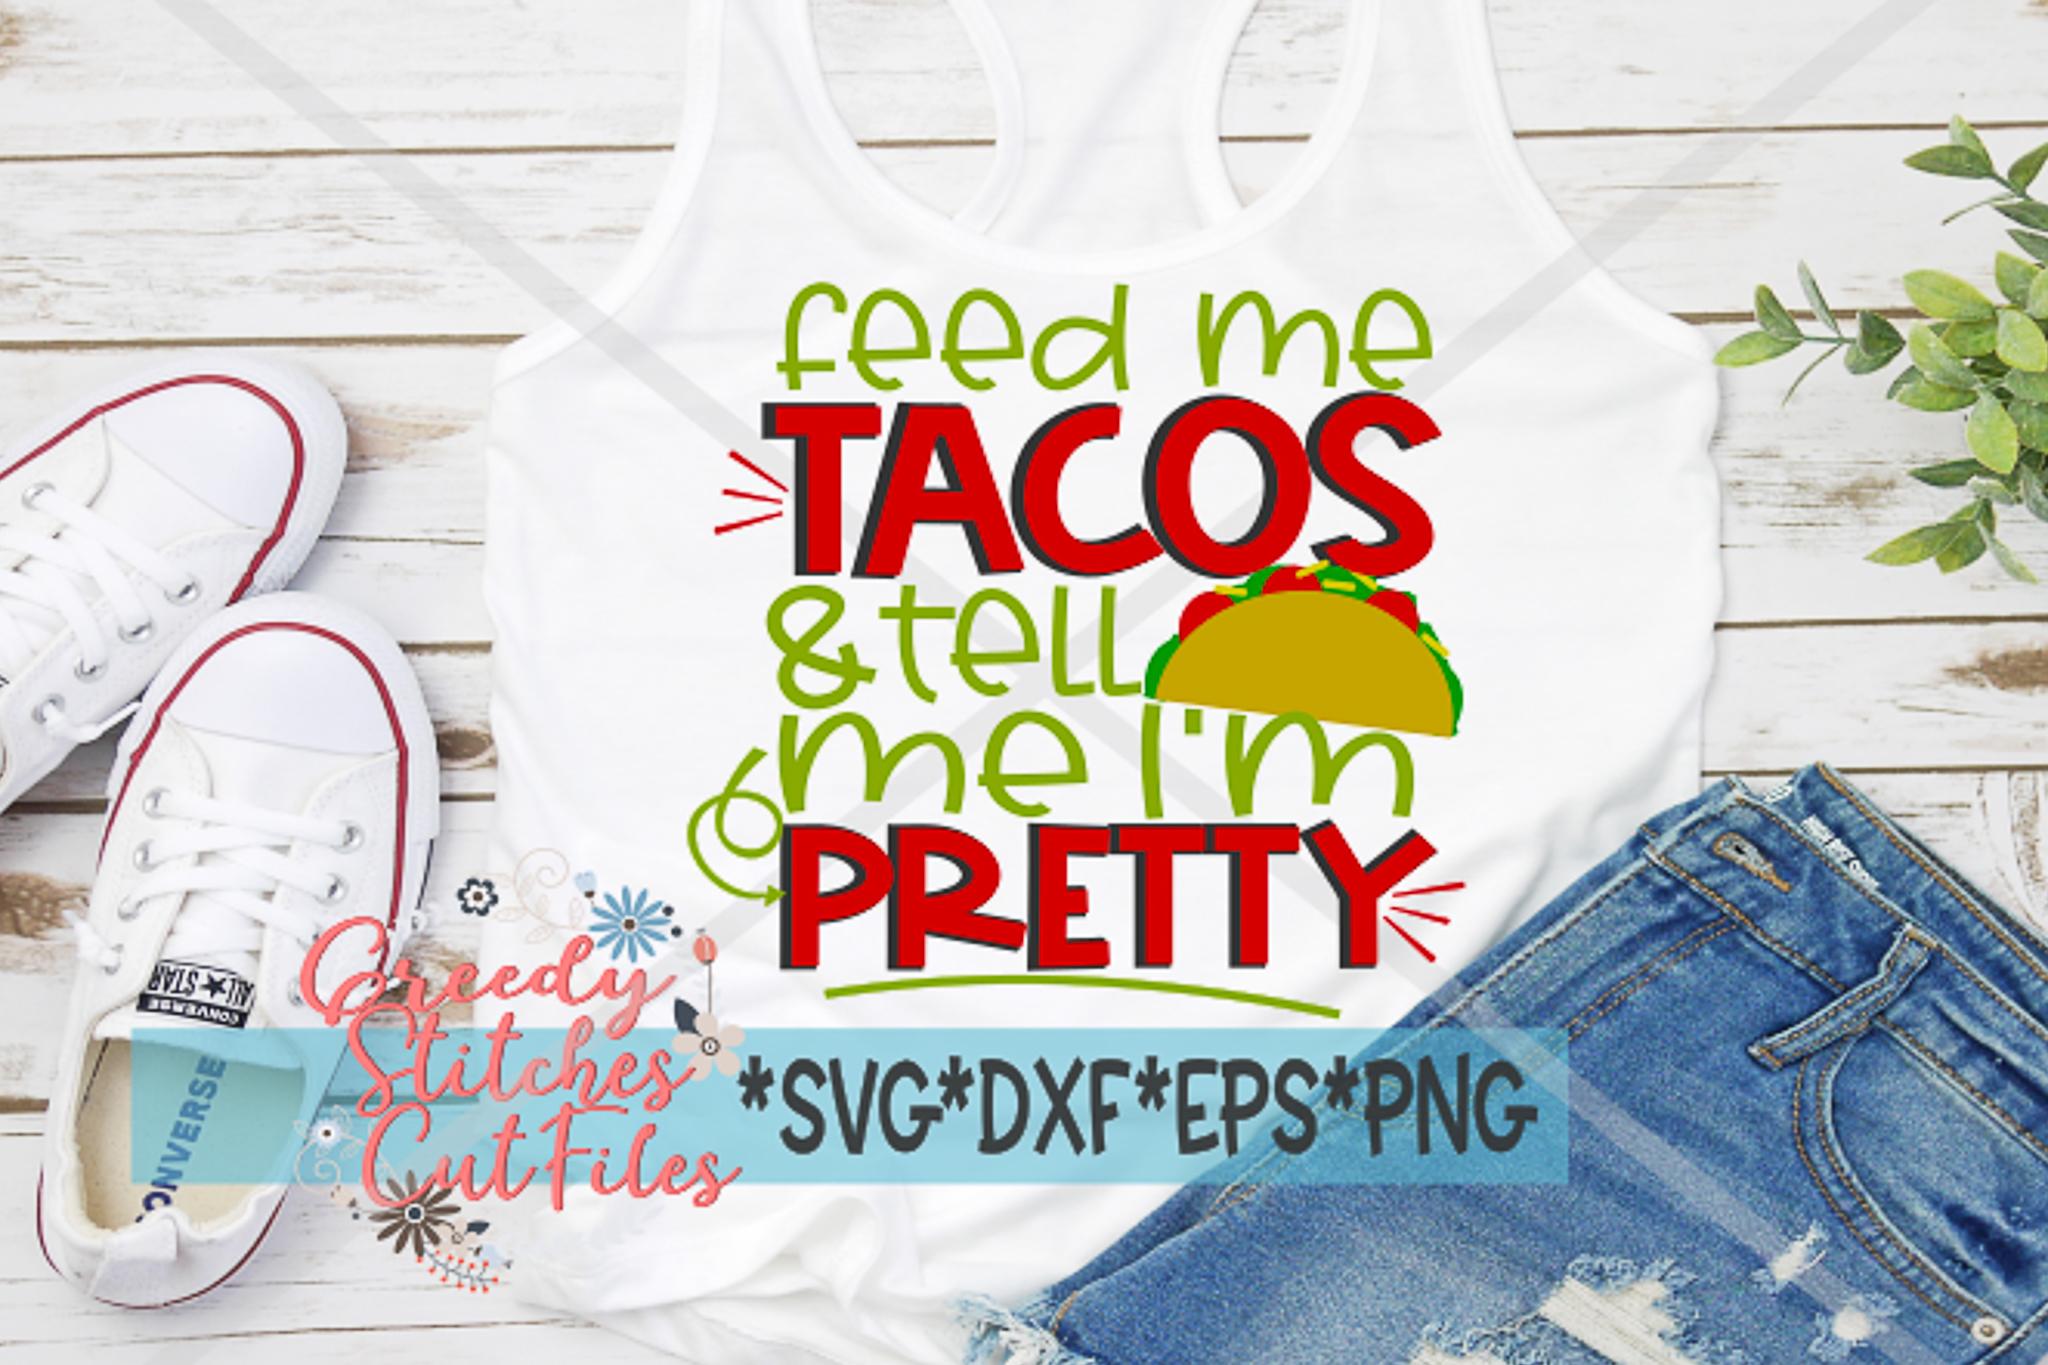 Cinco de Mayo | Feed Me Tacos & Tell Me I'm Pretty svg example image 4